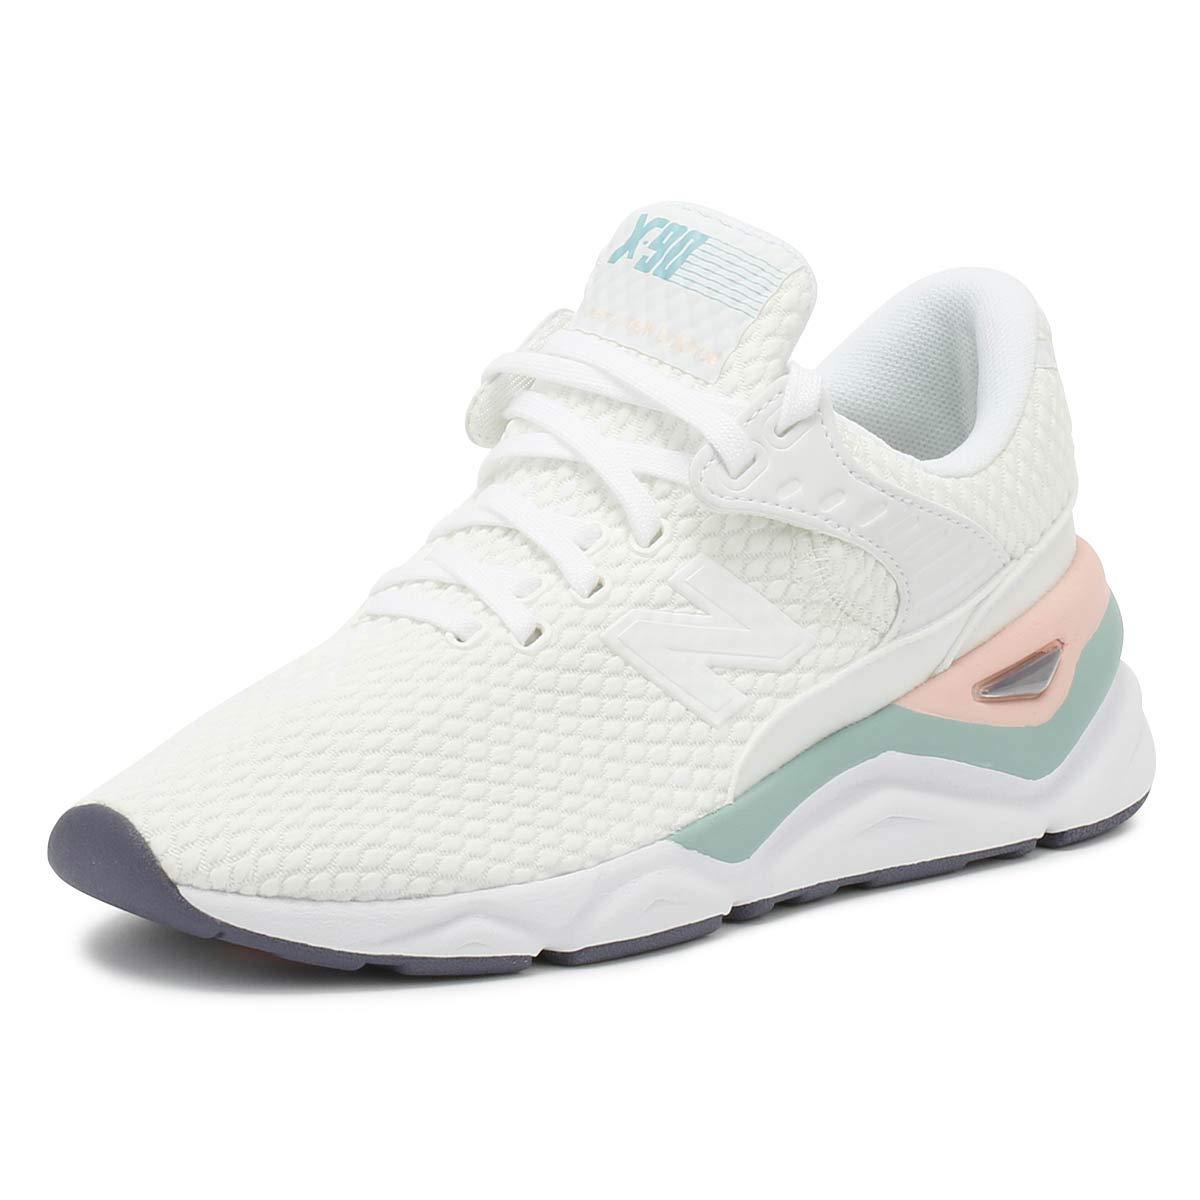 2b961111de640 Amazon.com   New Balance Womens X90 White Sport Sneakers-UK 3 ...